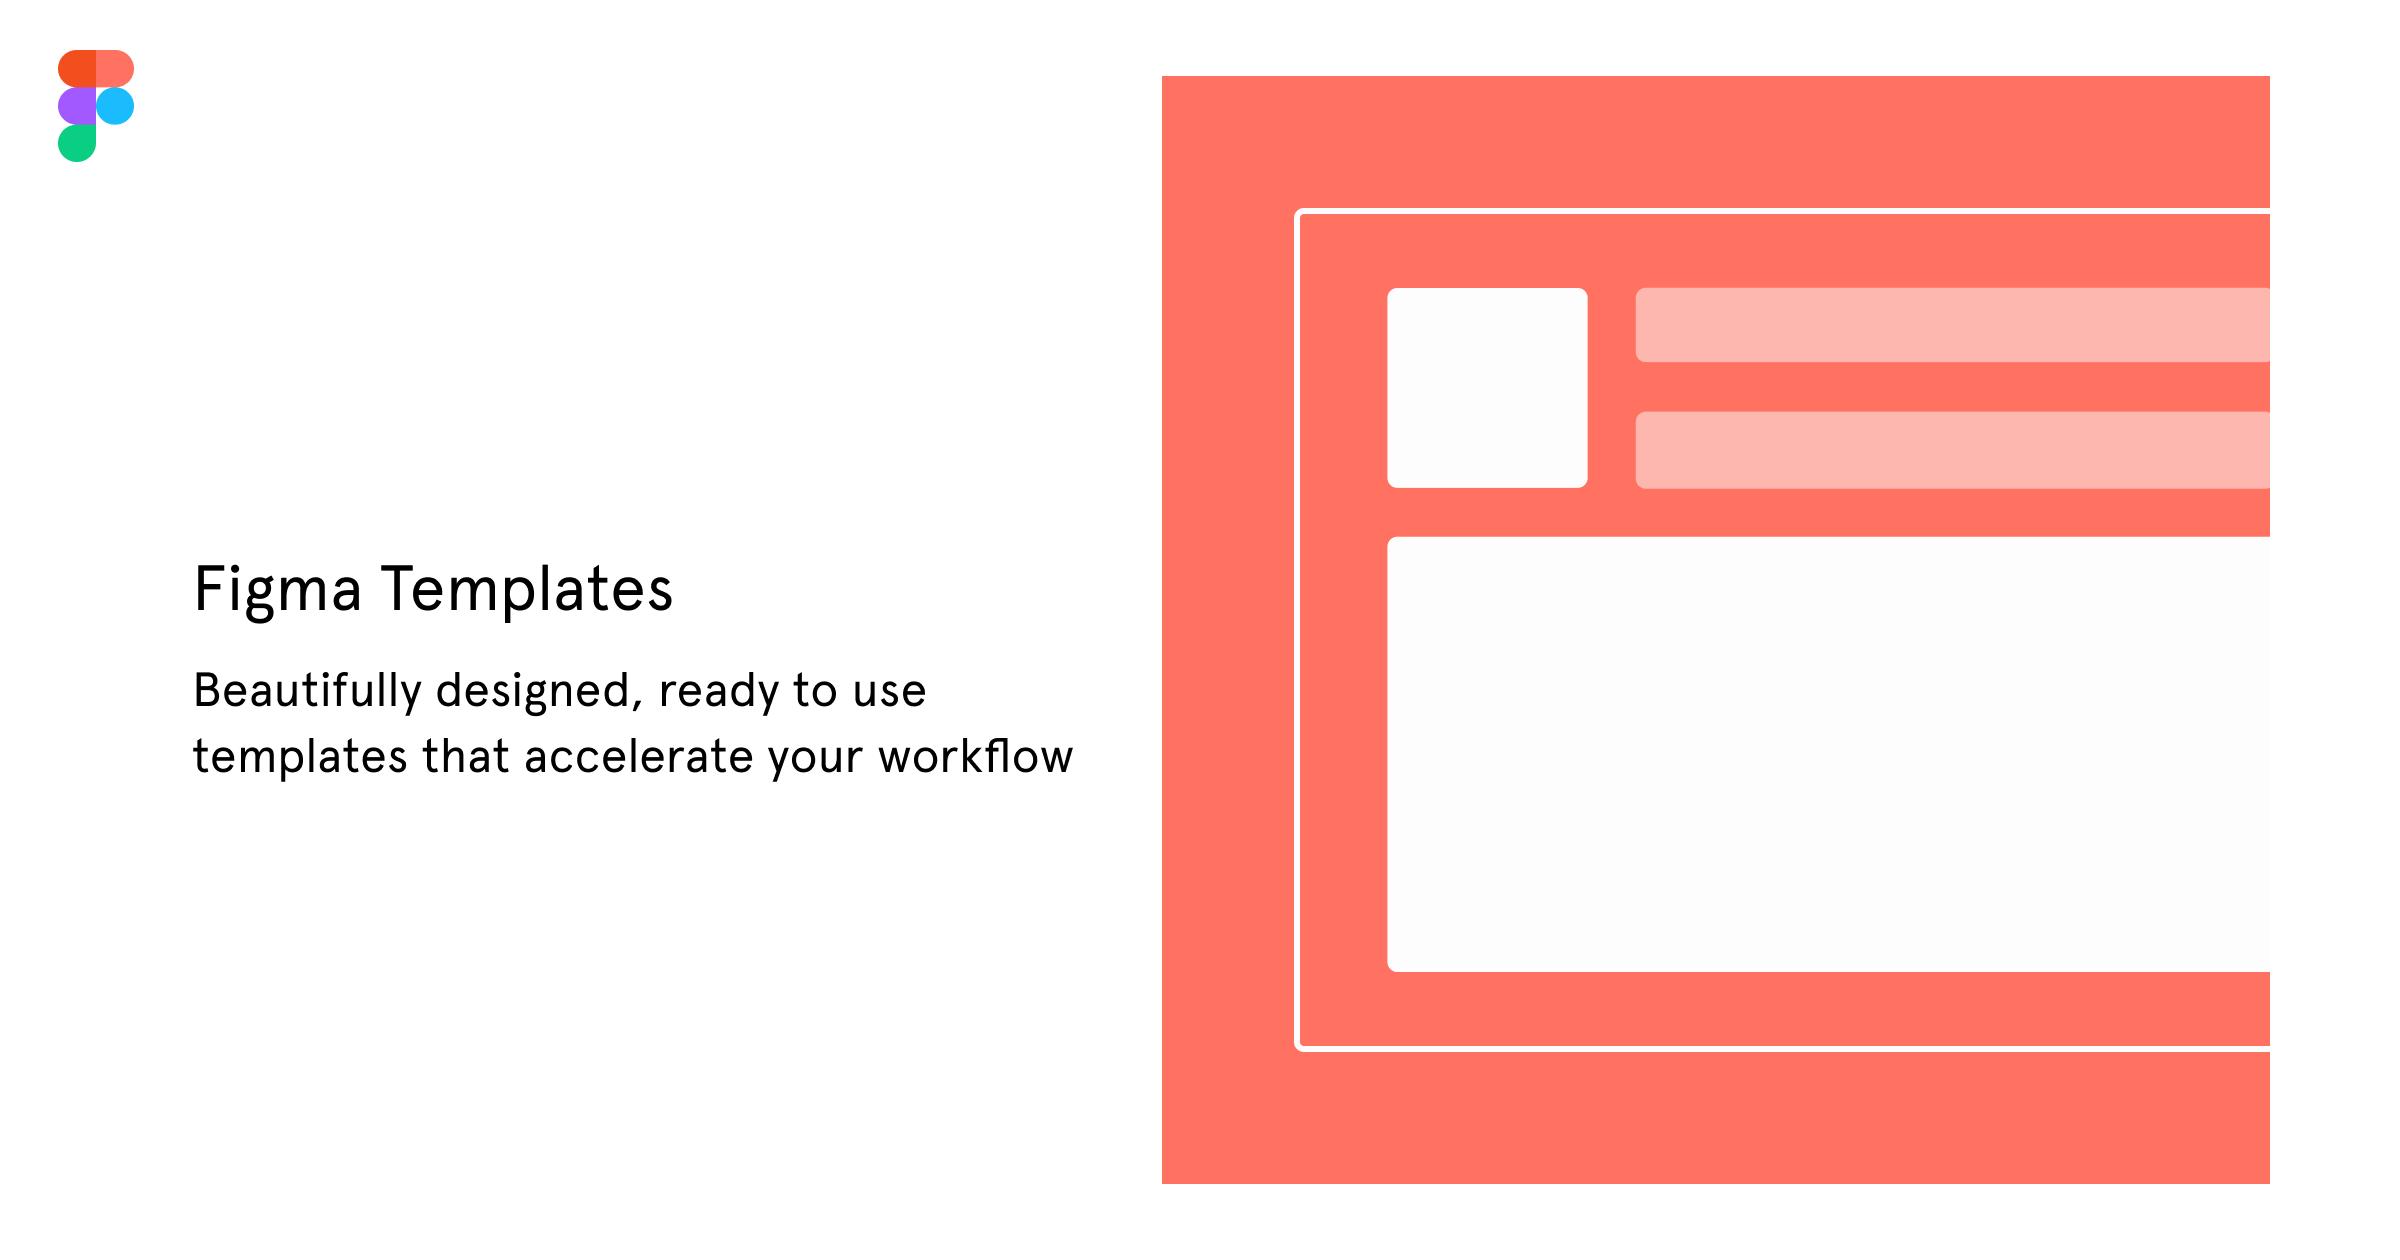 Free Figma UI Kits, Wireframe Kits, Templates, Icons and More